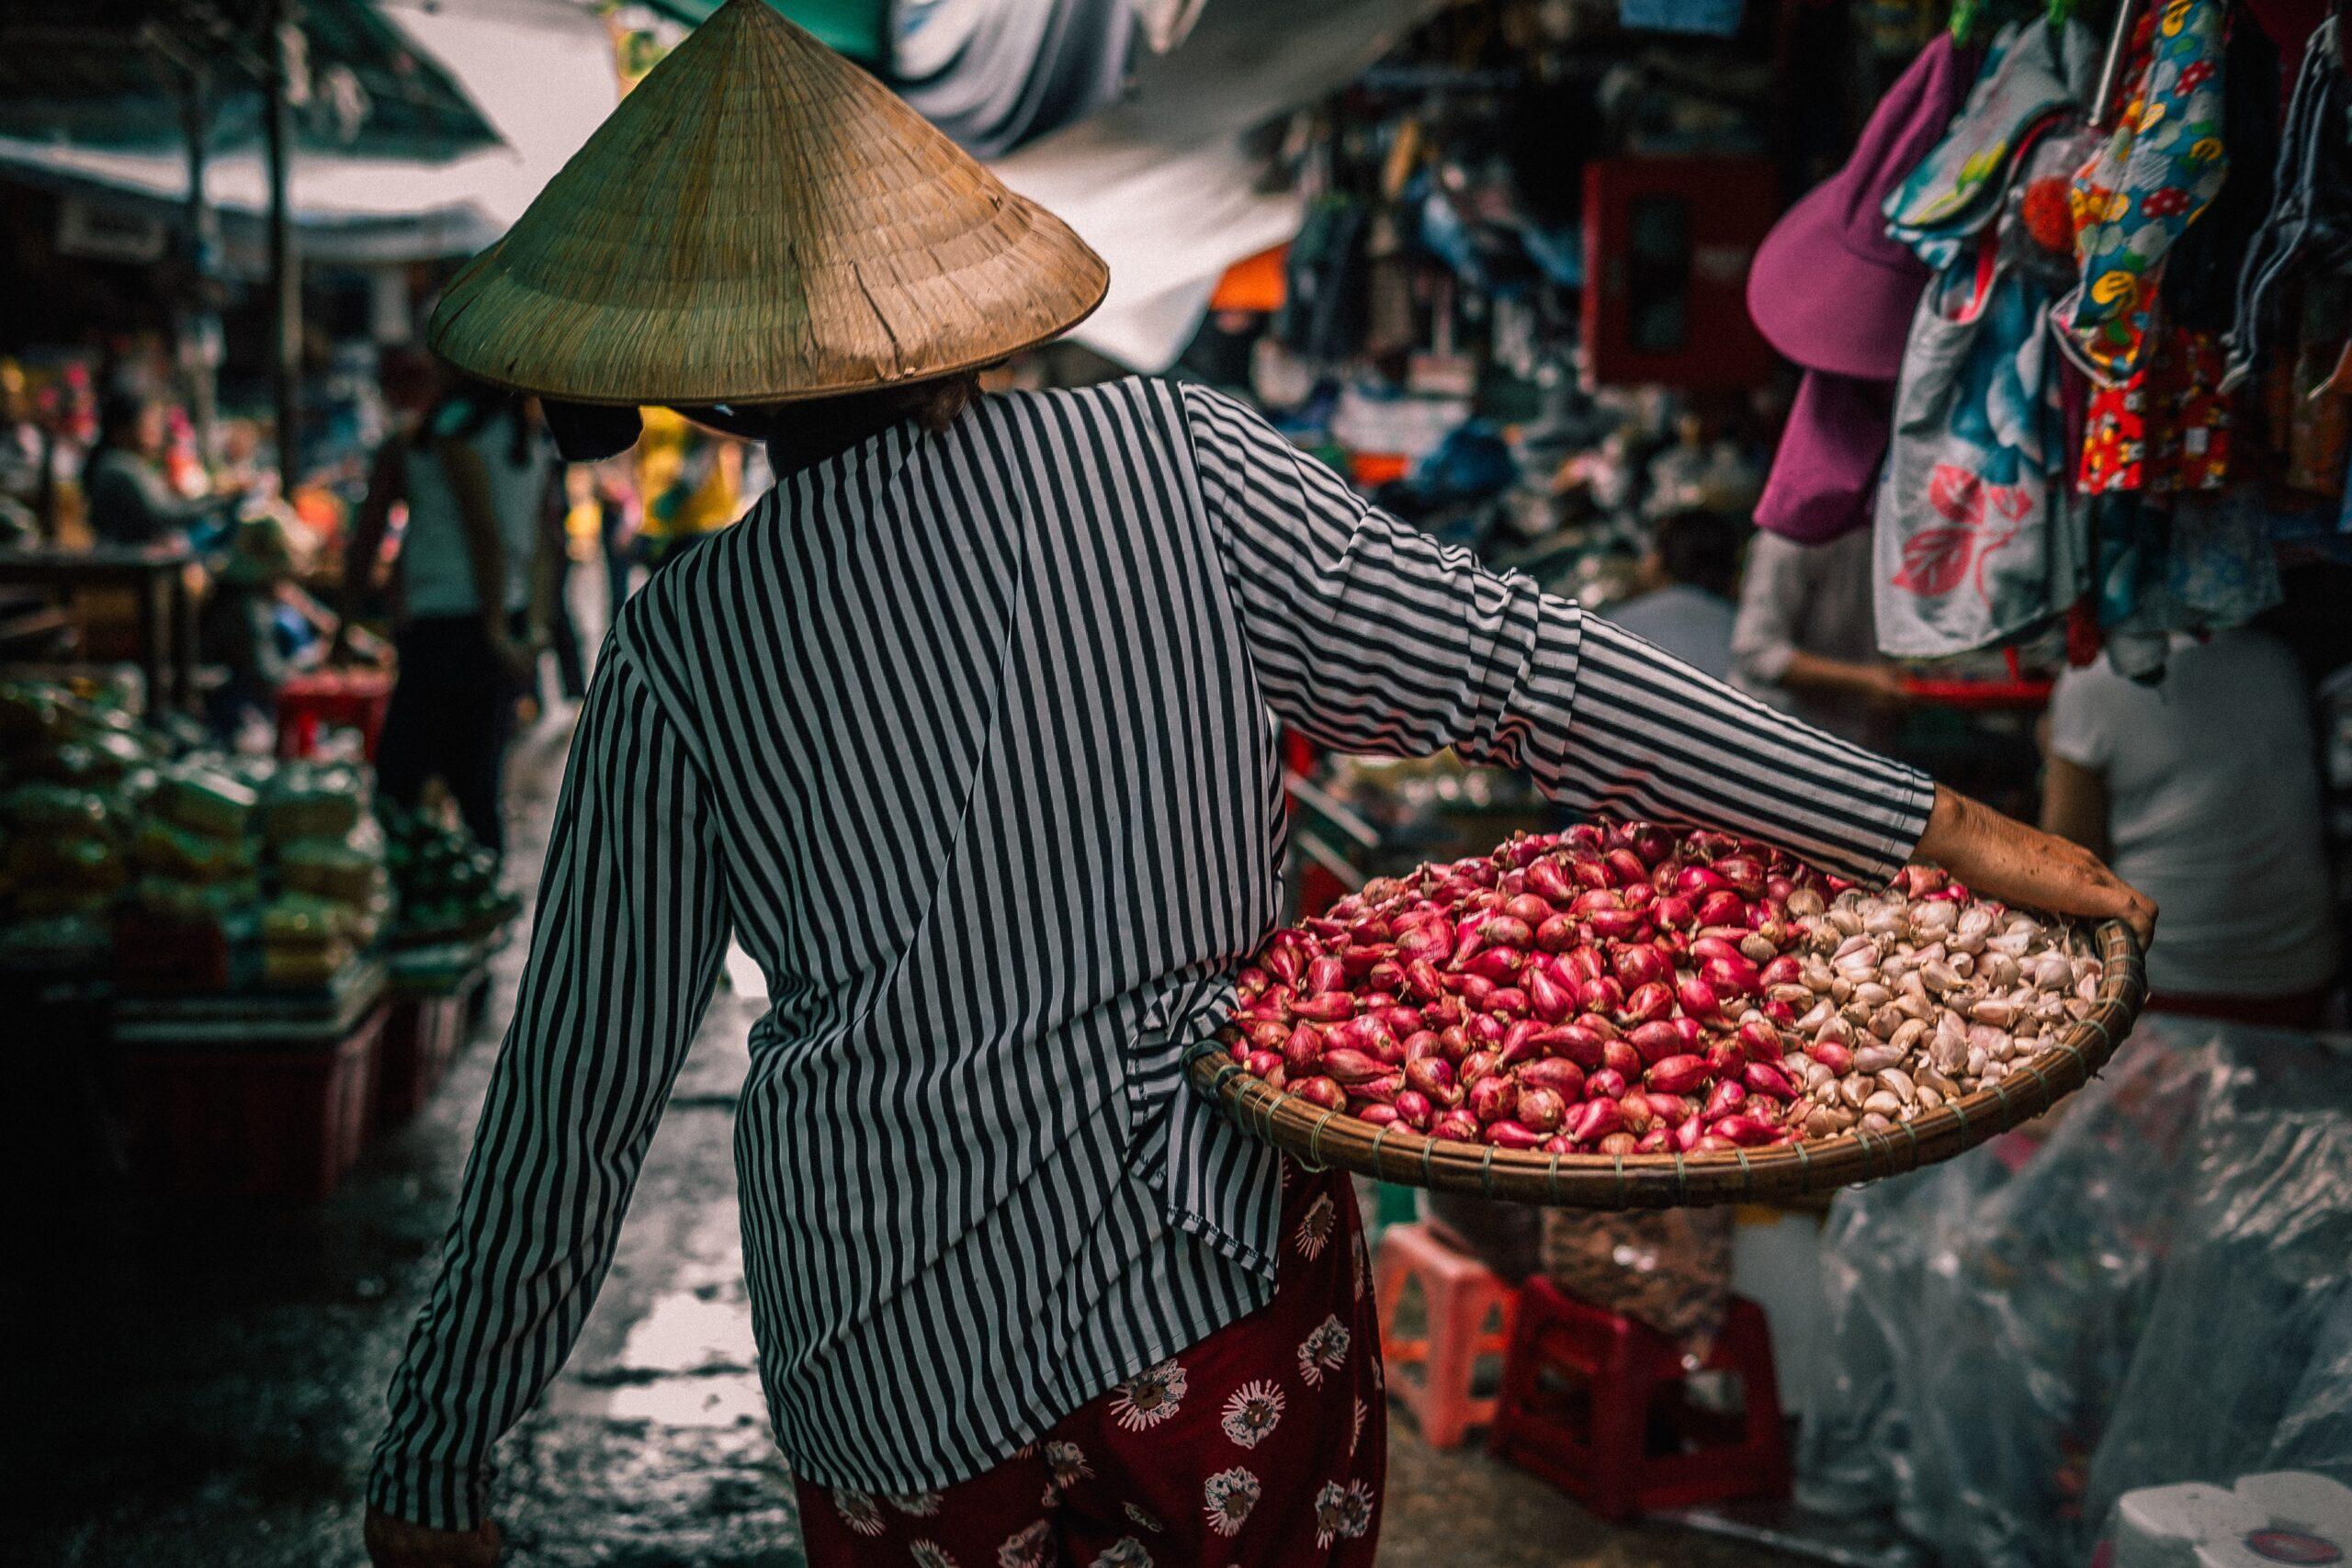 Woman carrying food basket